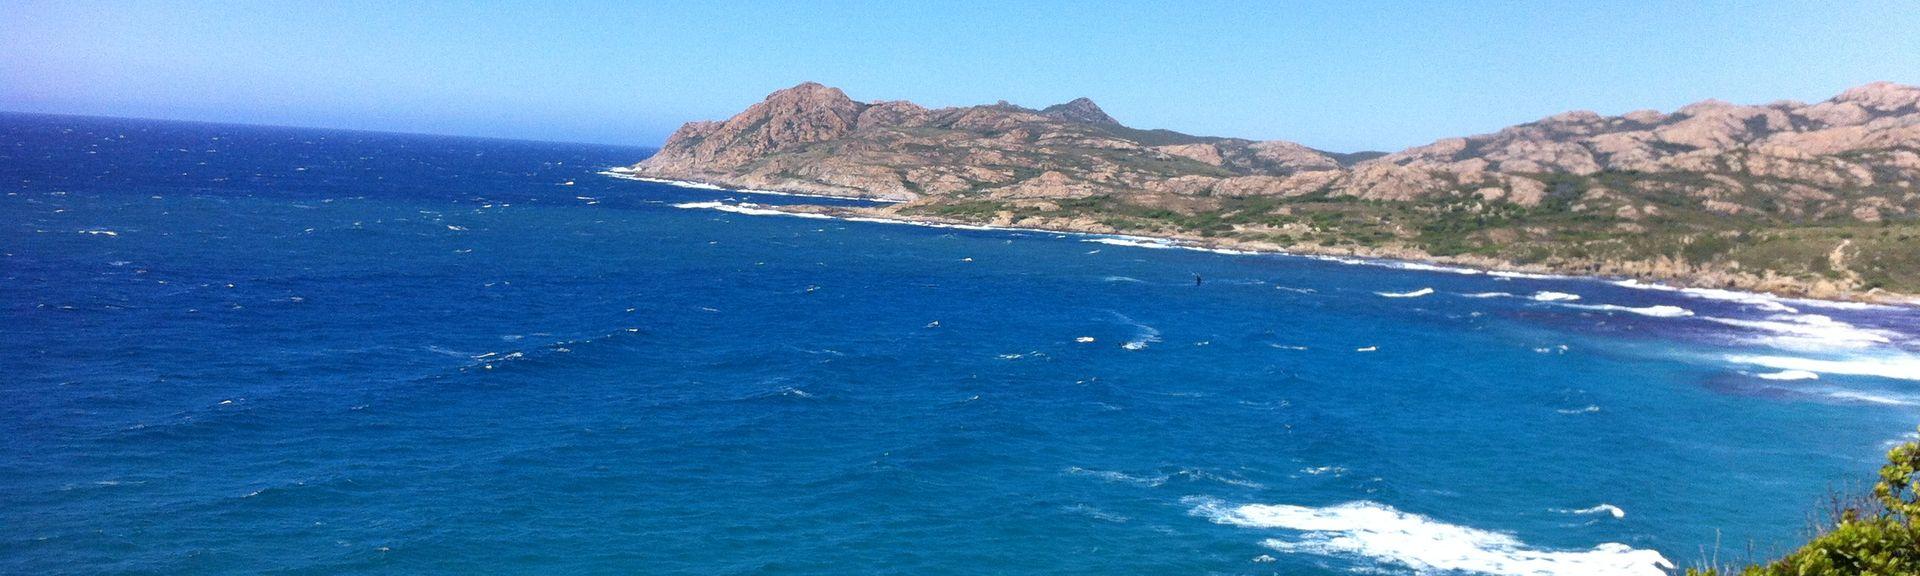 Asco, Korsika, Frankrike